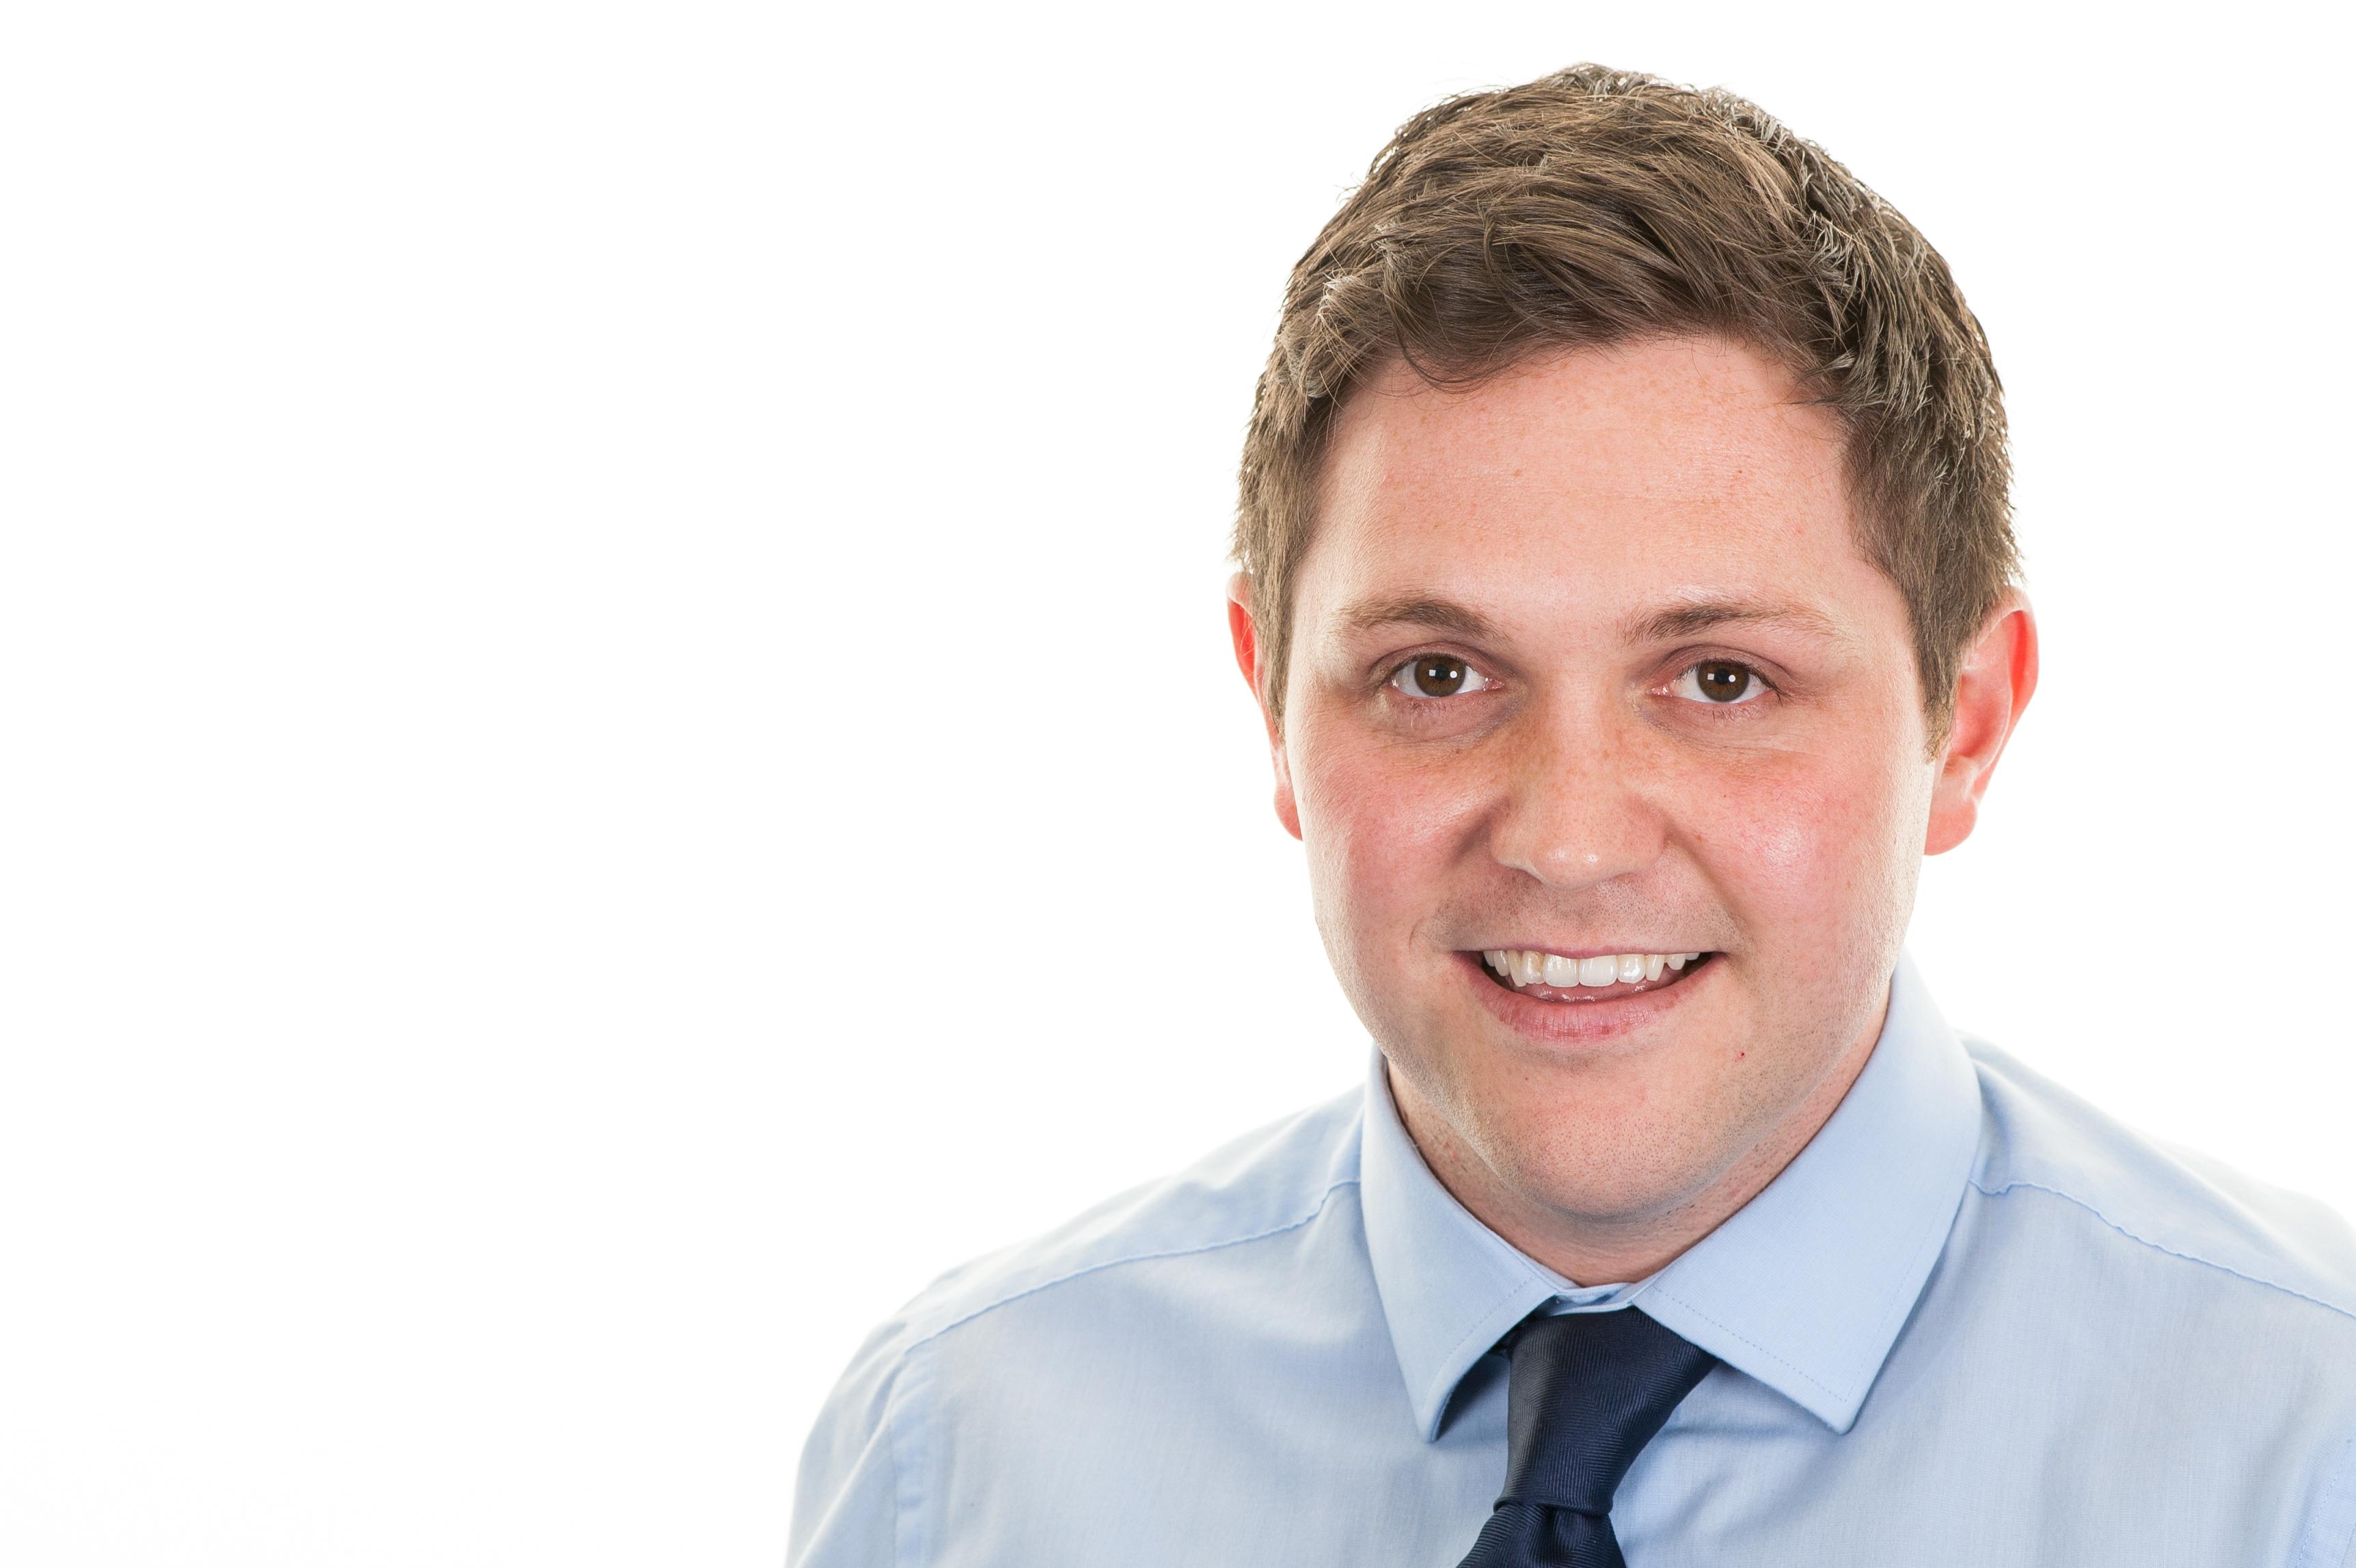 ICS Managing Director, John Lyon